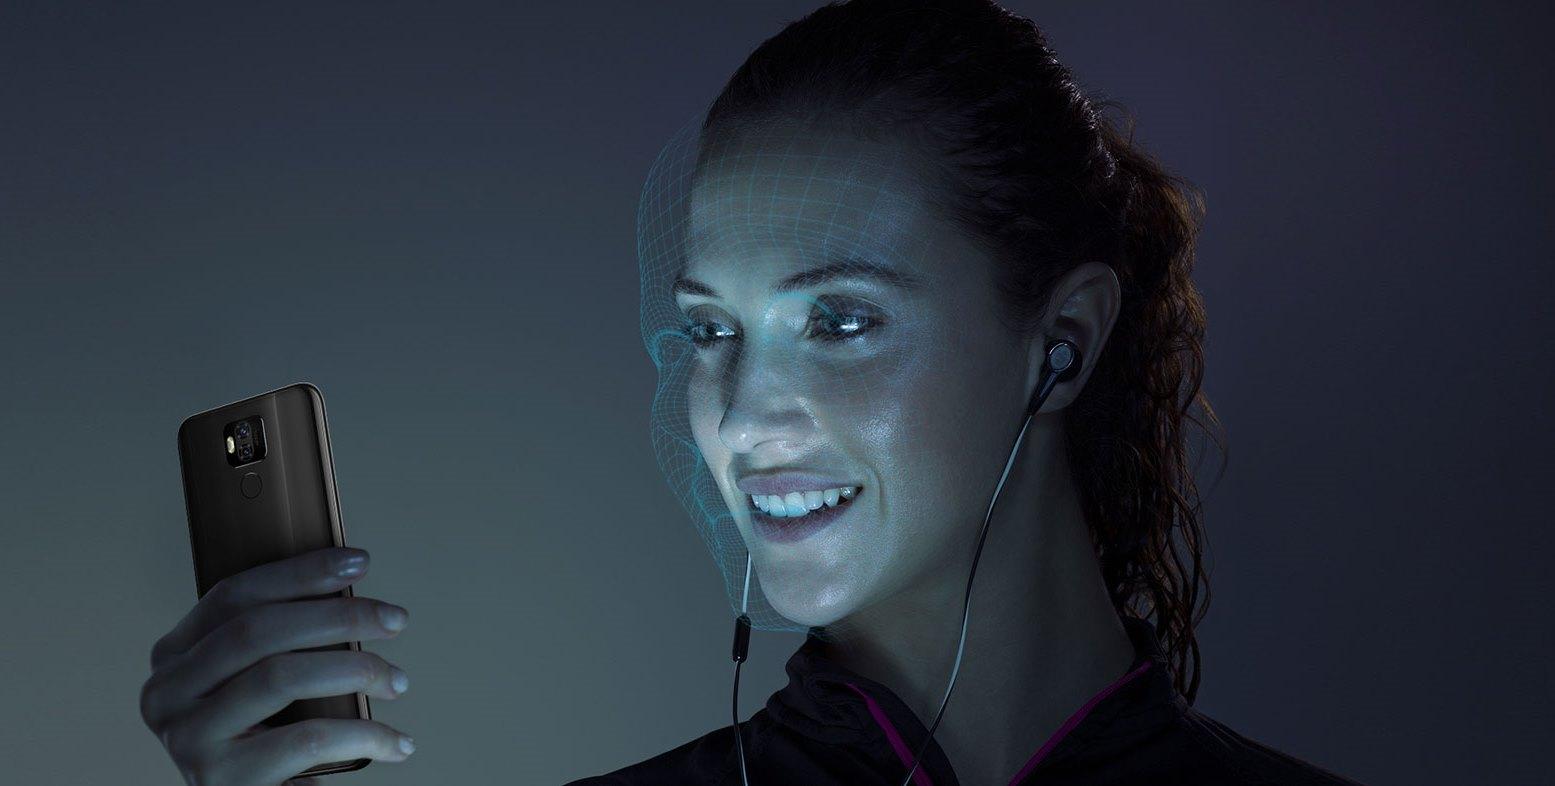 Ulefone power 6 podporuje funkciu rozpoznania tváre